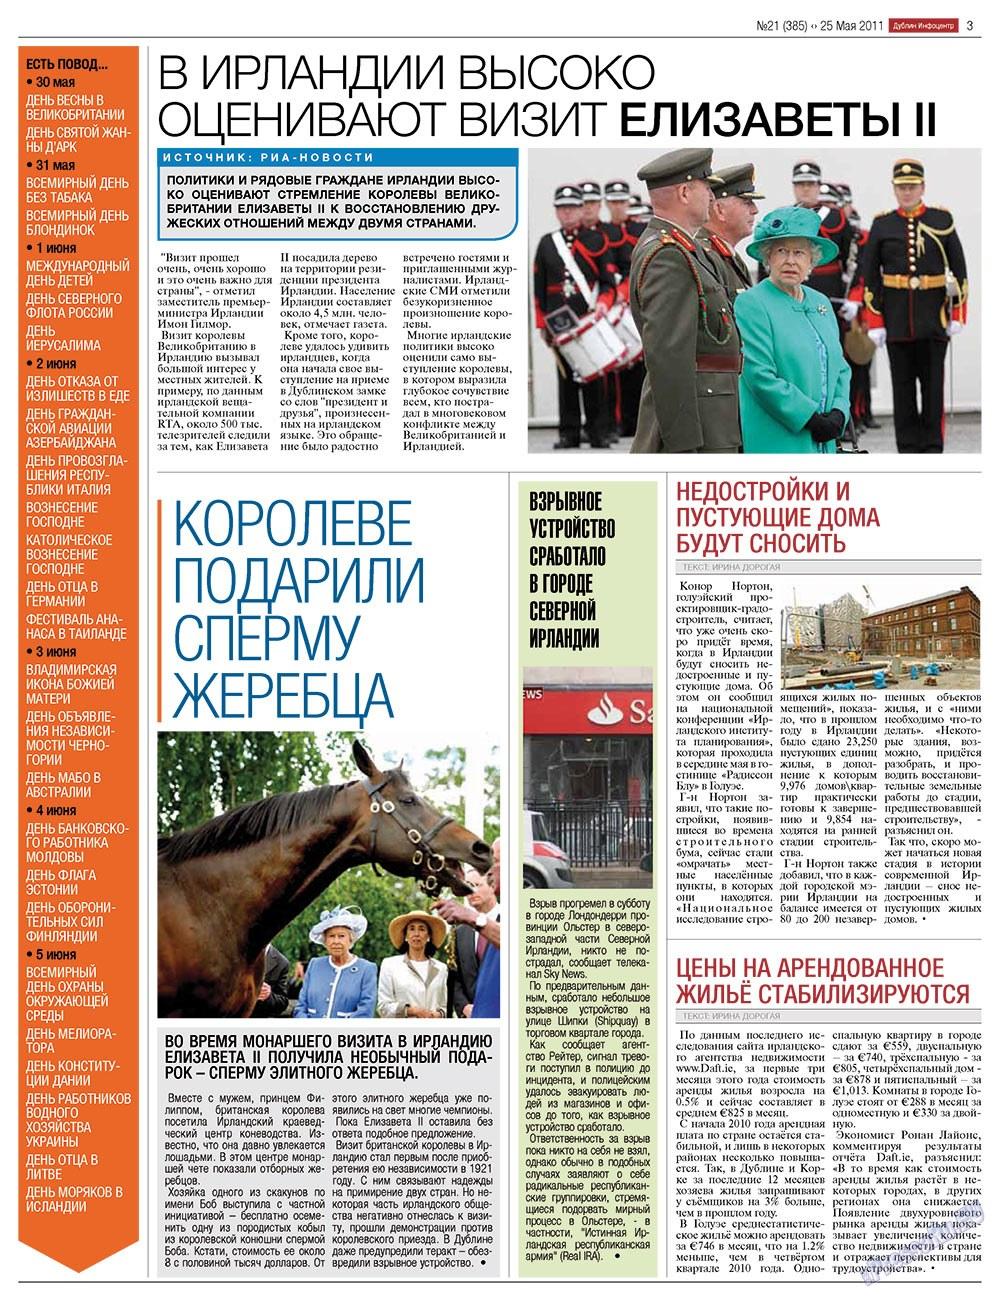 Дублин инфоцентр (газета). 2011 год, номер 21, стр. 3